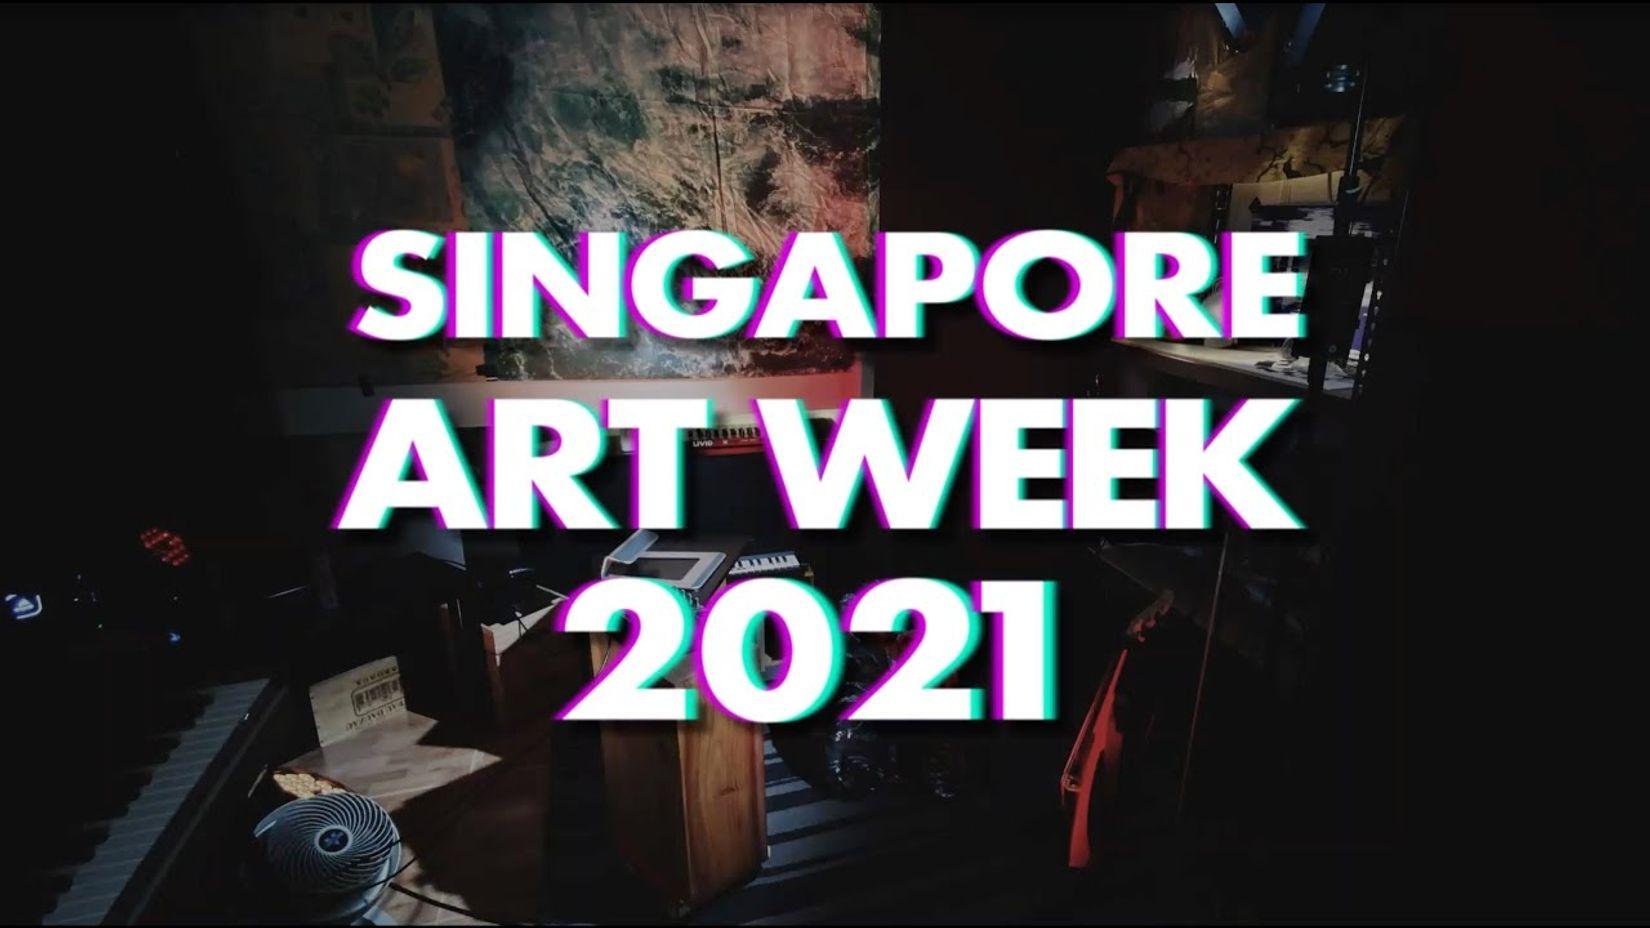 'Art Takes Over' at Singapore Art Week 2021